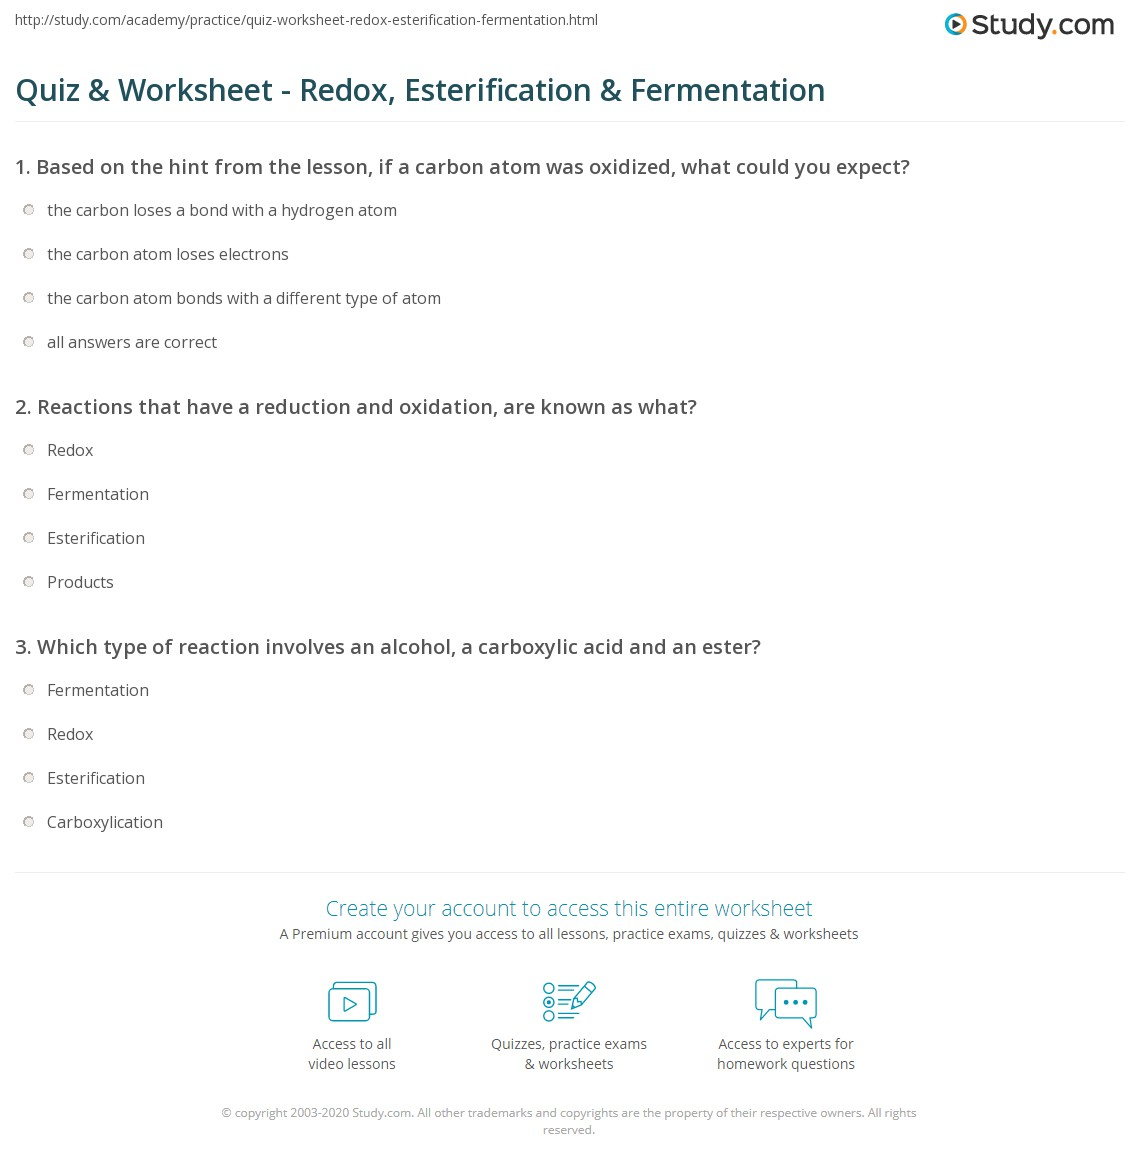 Worksheets Chapter 20 Worksheet Redox quiz worksheet redox esterification fermentation study com print organic chemical reactions worksheet